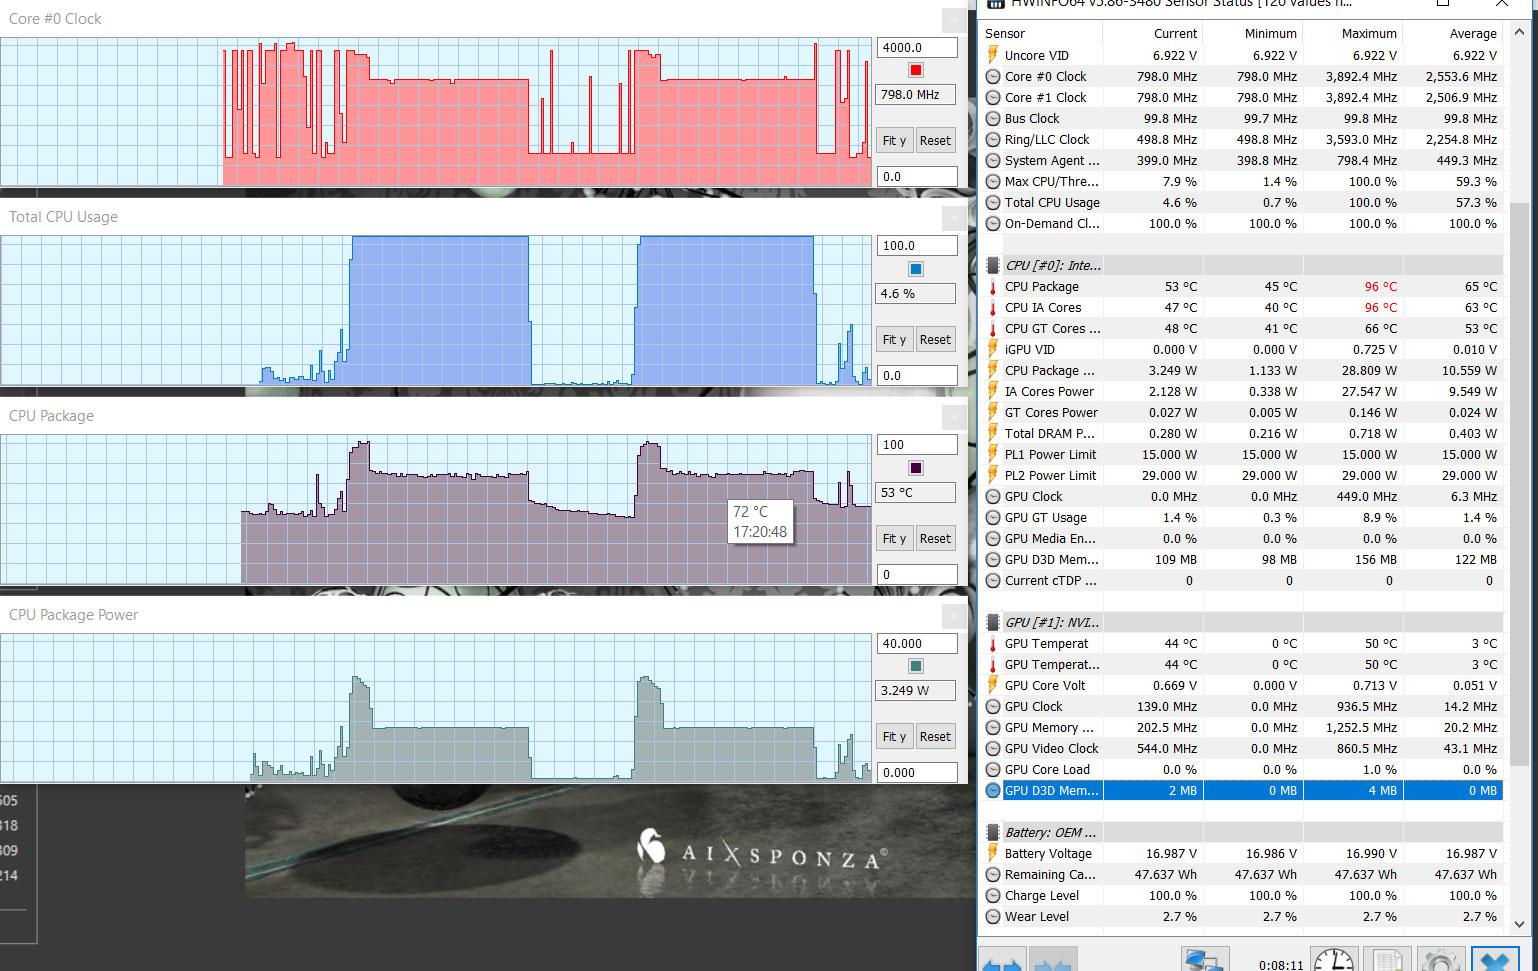 Intel Core i3-8145U benchmarks (Whiskey Lake U) - vs i3